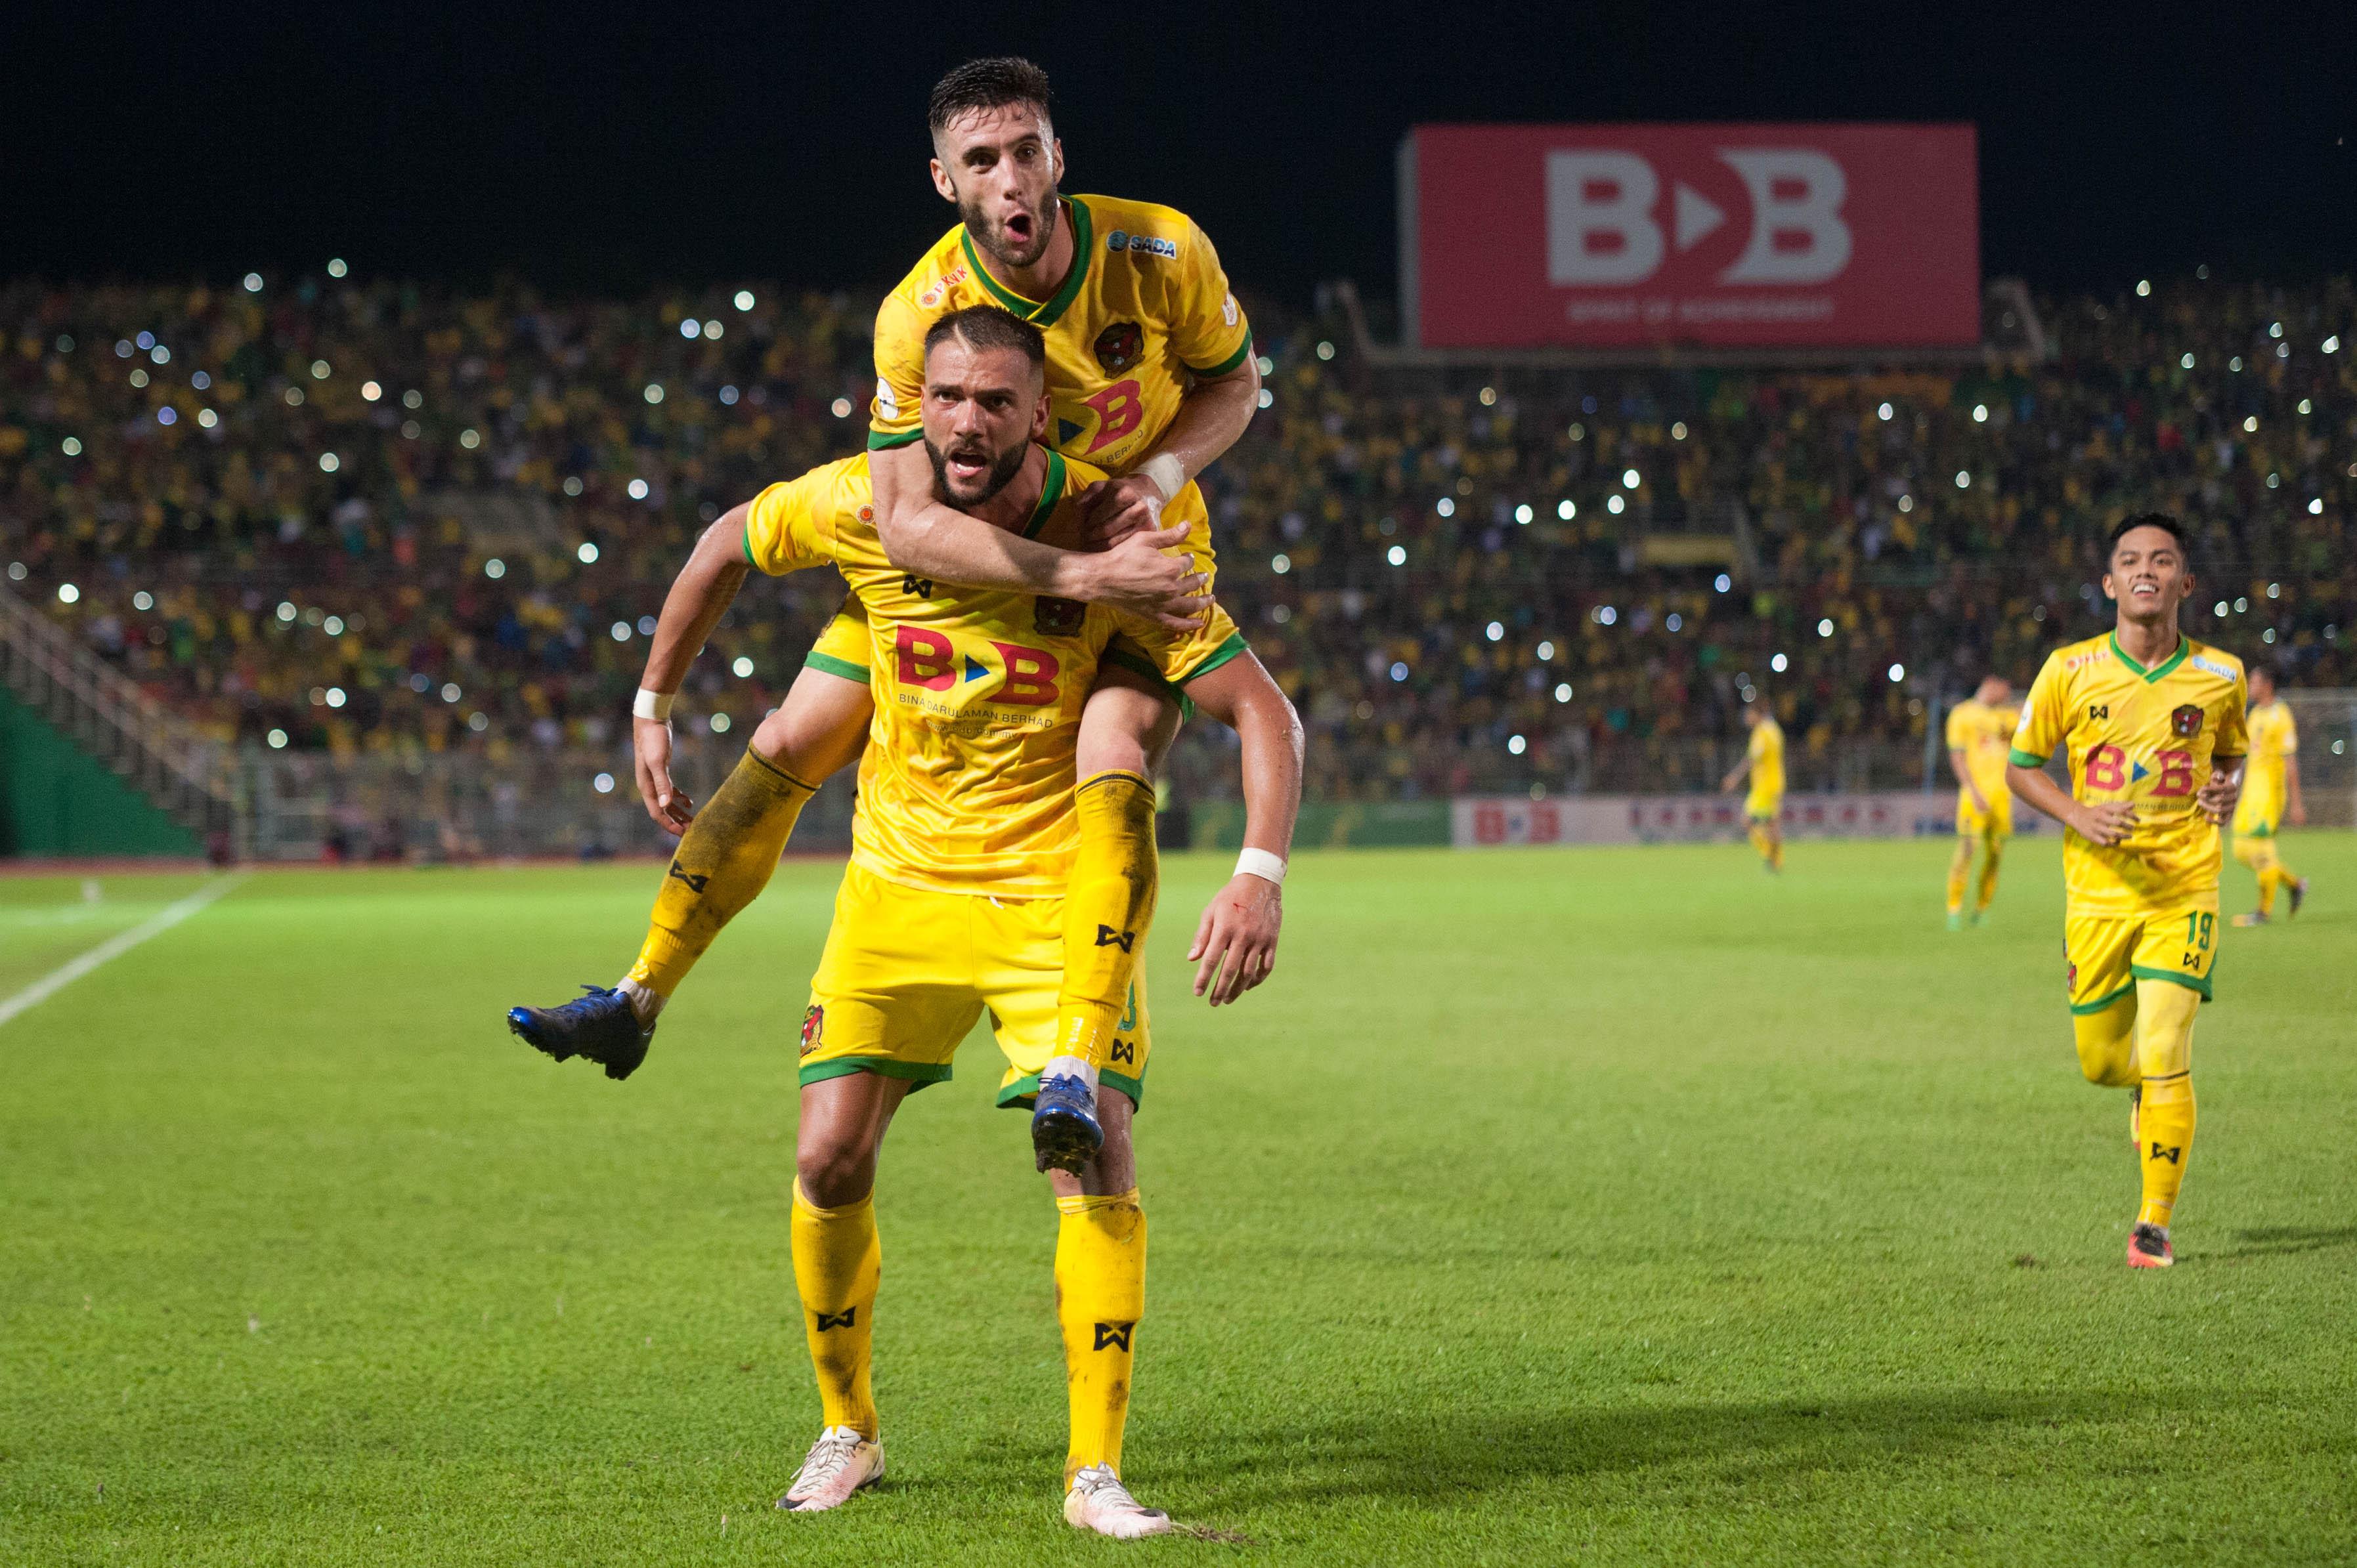 Thiago Augusto celebrates with Liridon Krasniqi after the latter scored